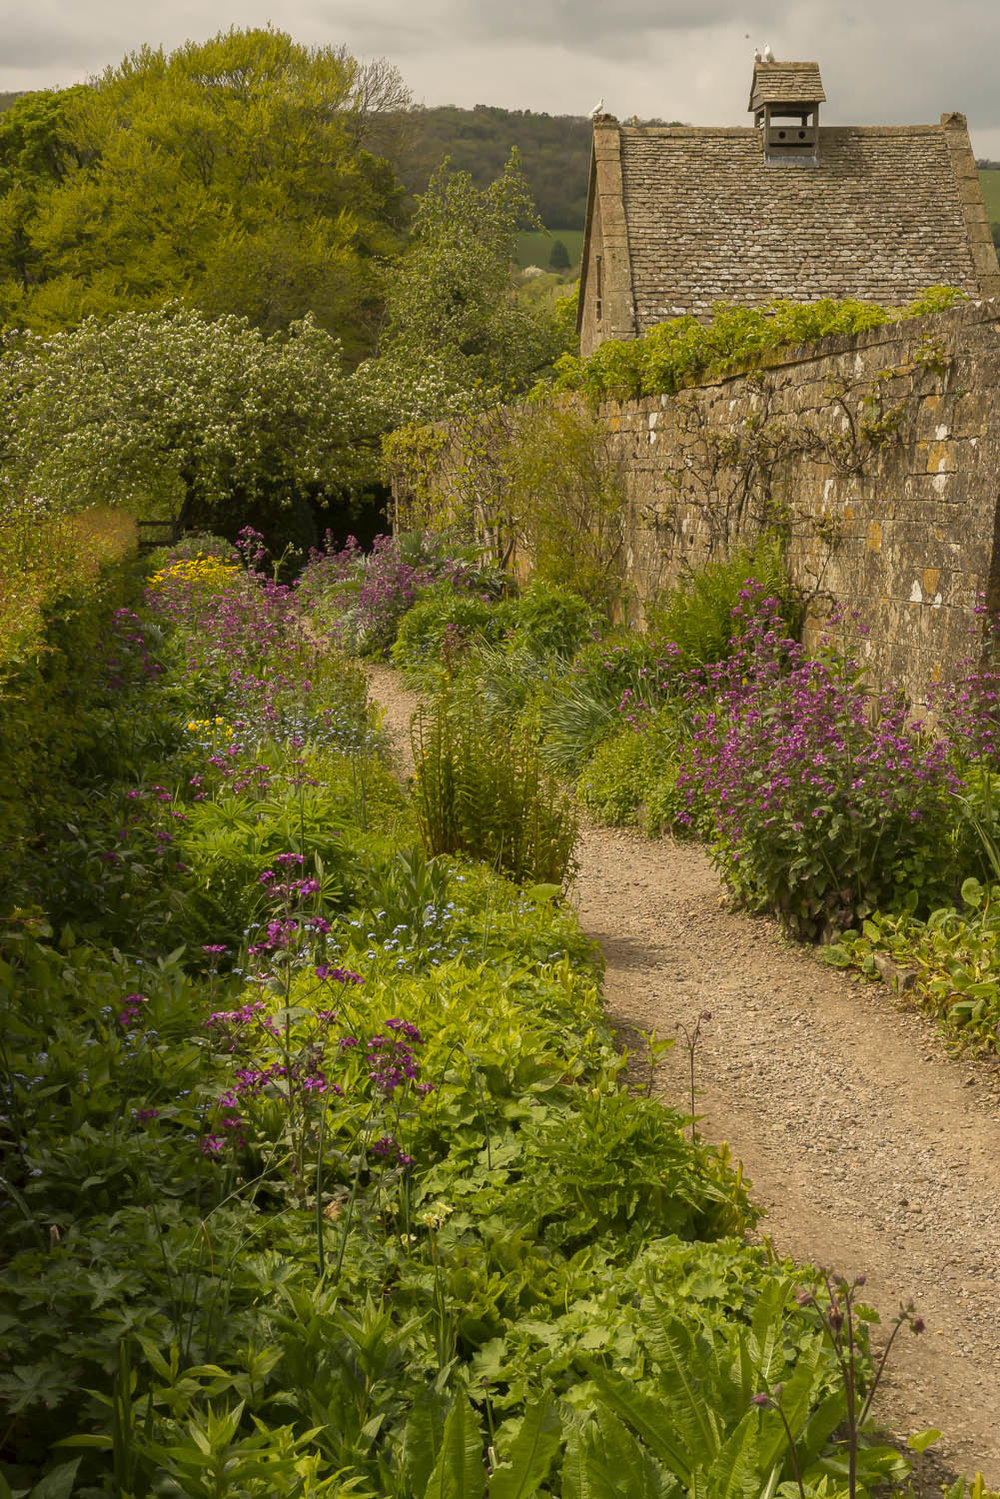 garden-Snowshill-flowers-Gloucestershire-Jo-Kearney-photos-landscape-photography-video-landscapes.jpg